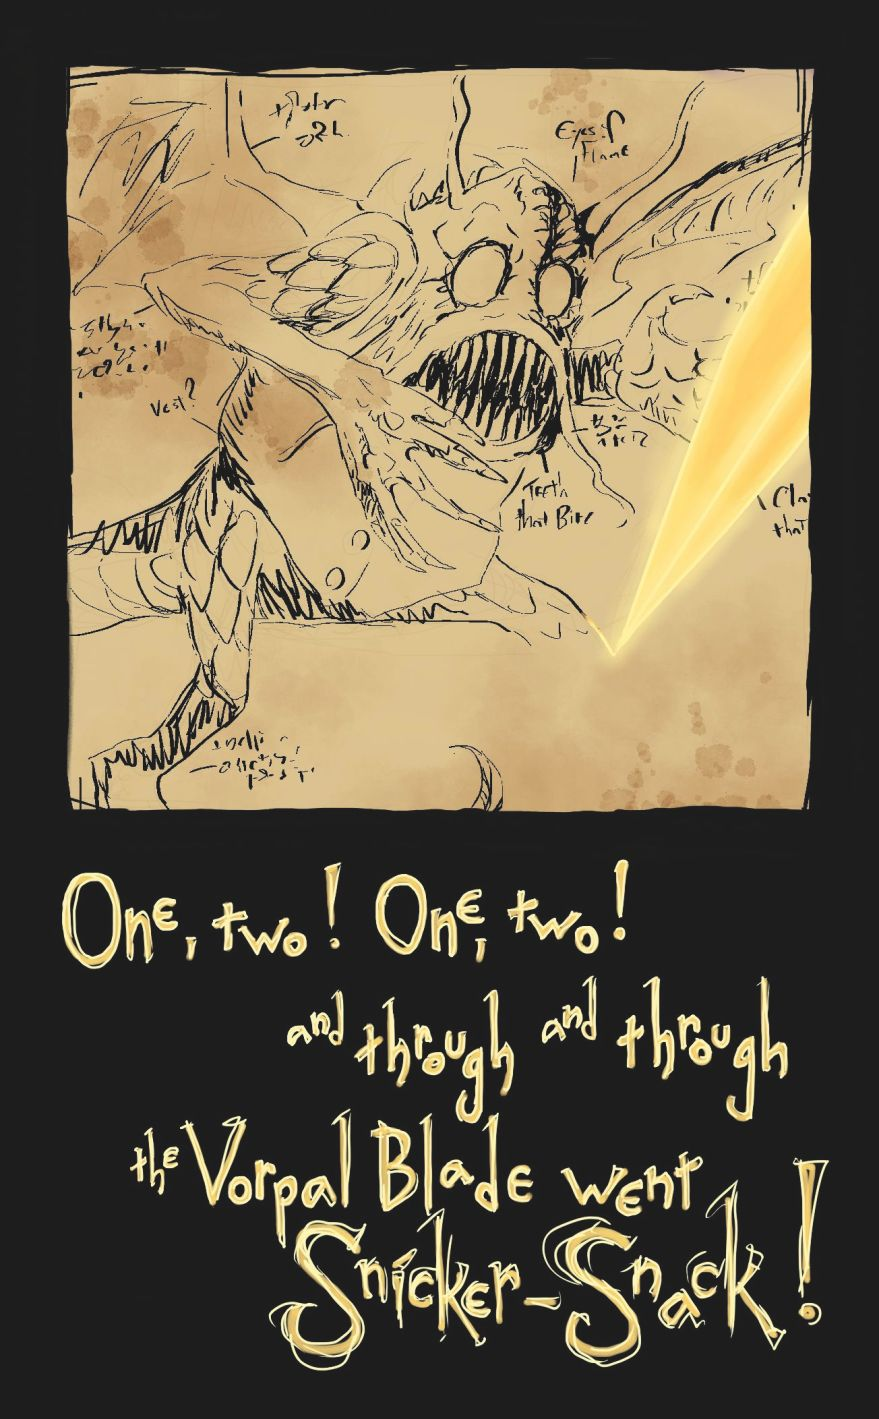 Jabberwocky Page 5